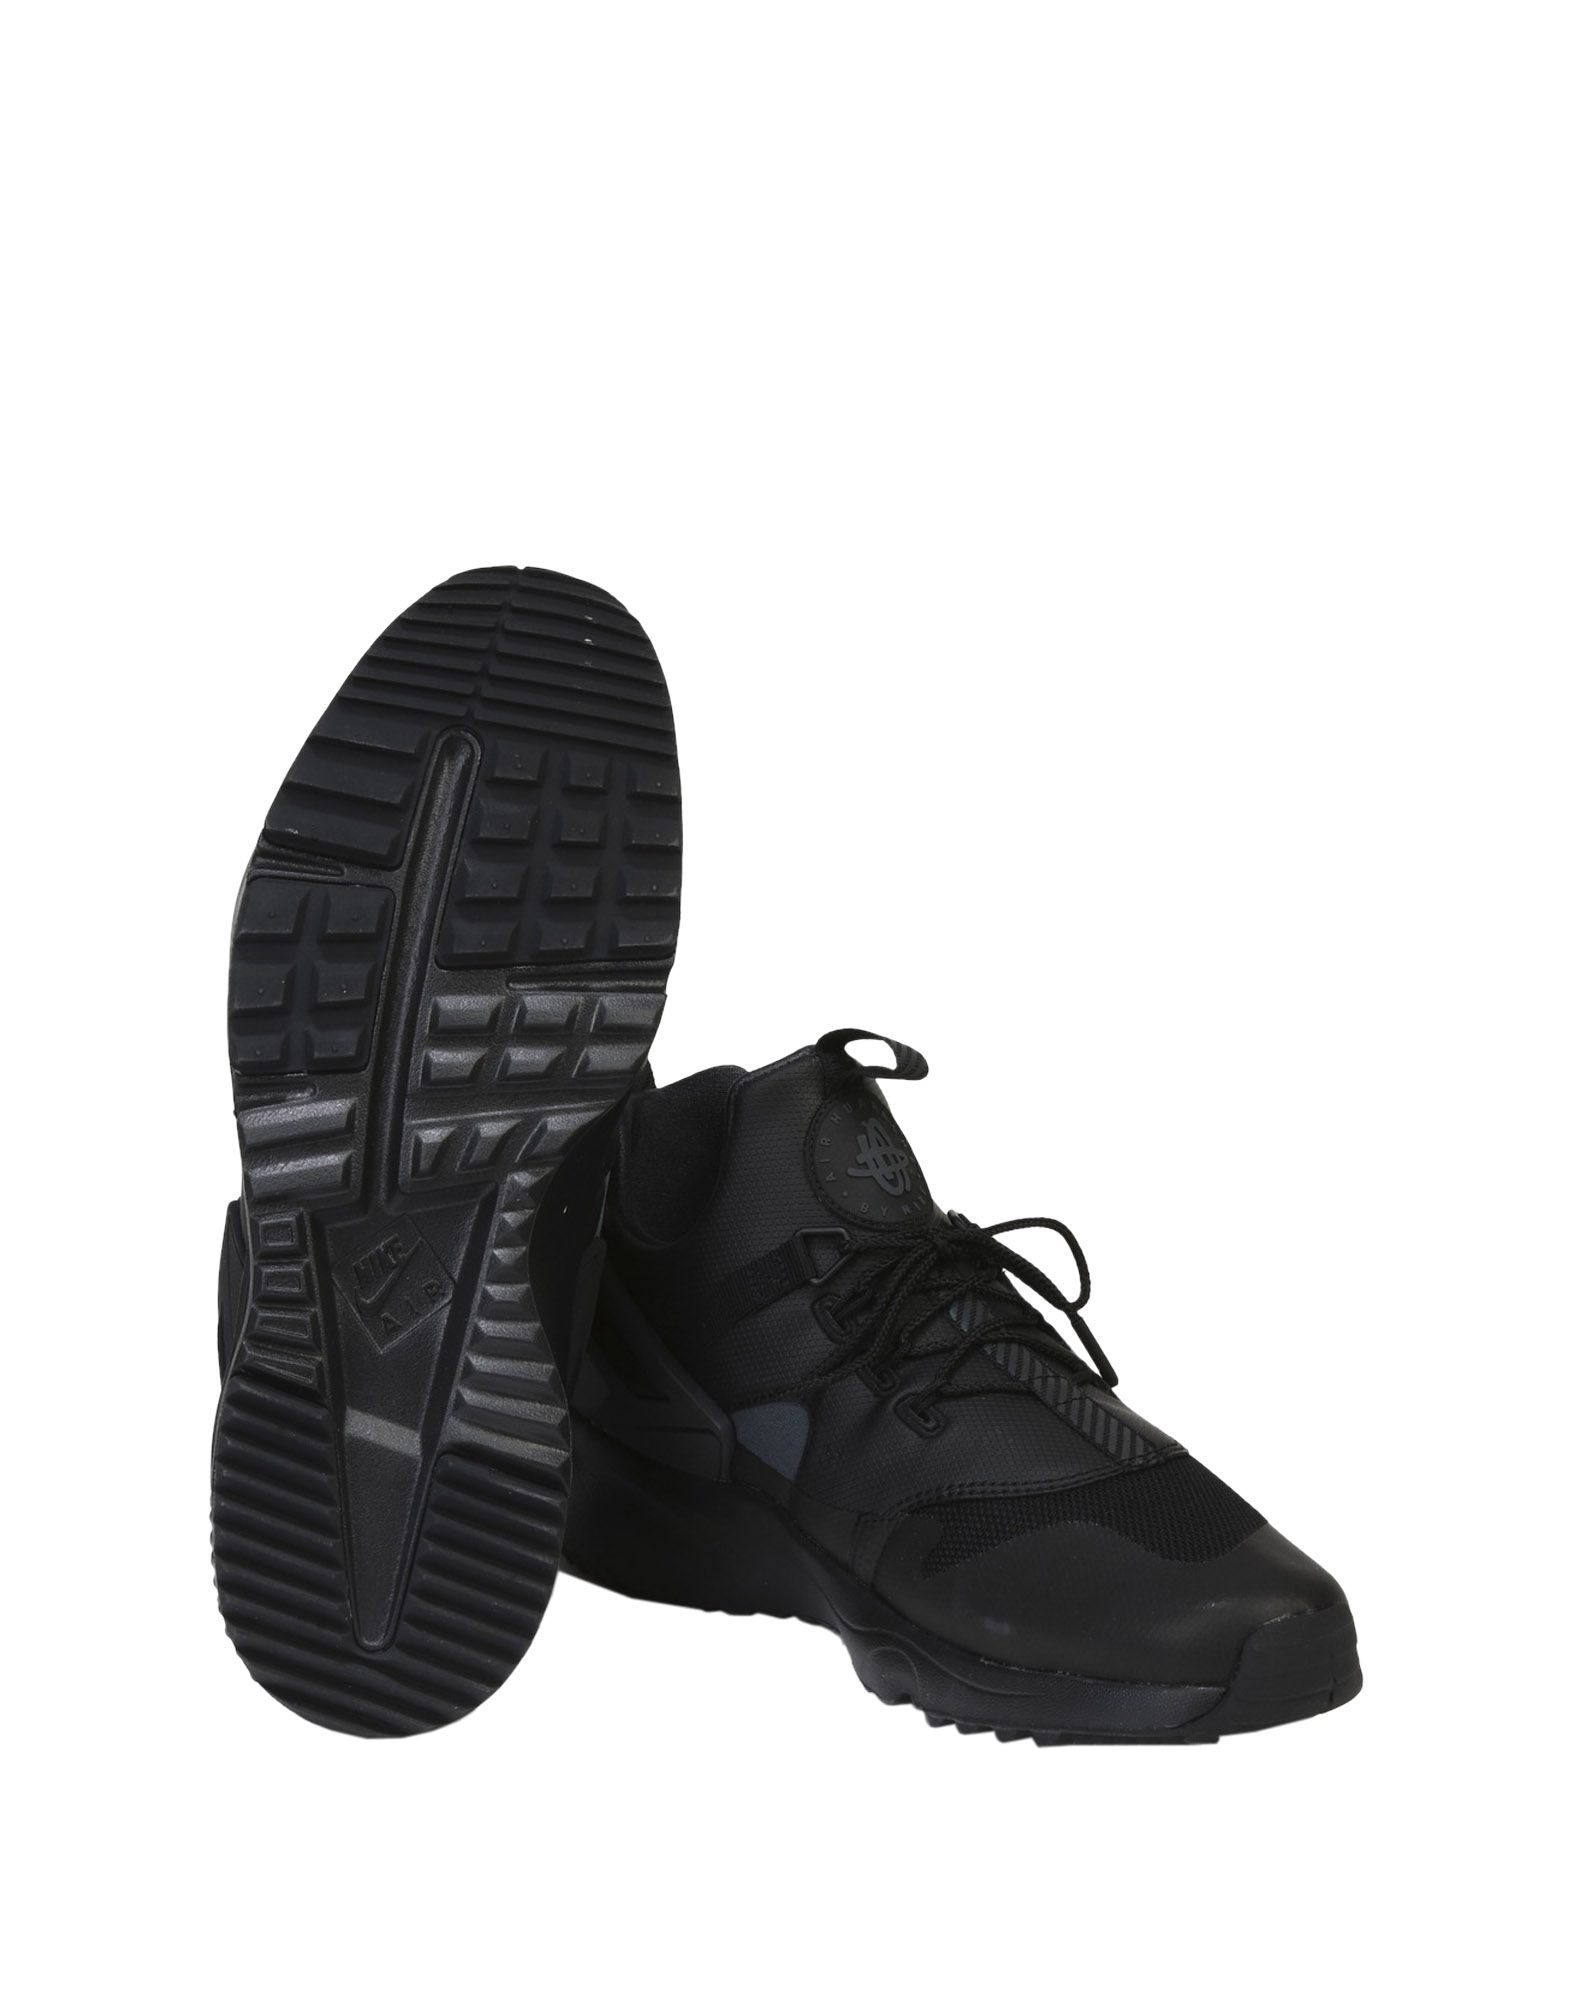 Sneakers Nike  Air Huarache Utility Premium - Homme - Sneakers Nike sur